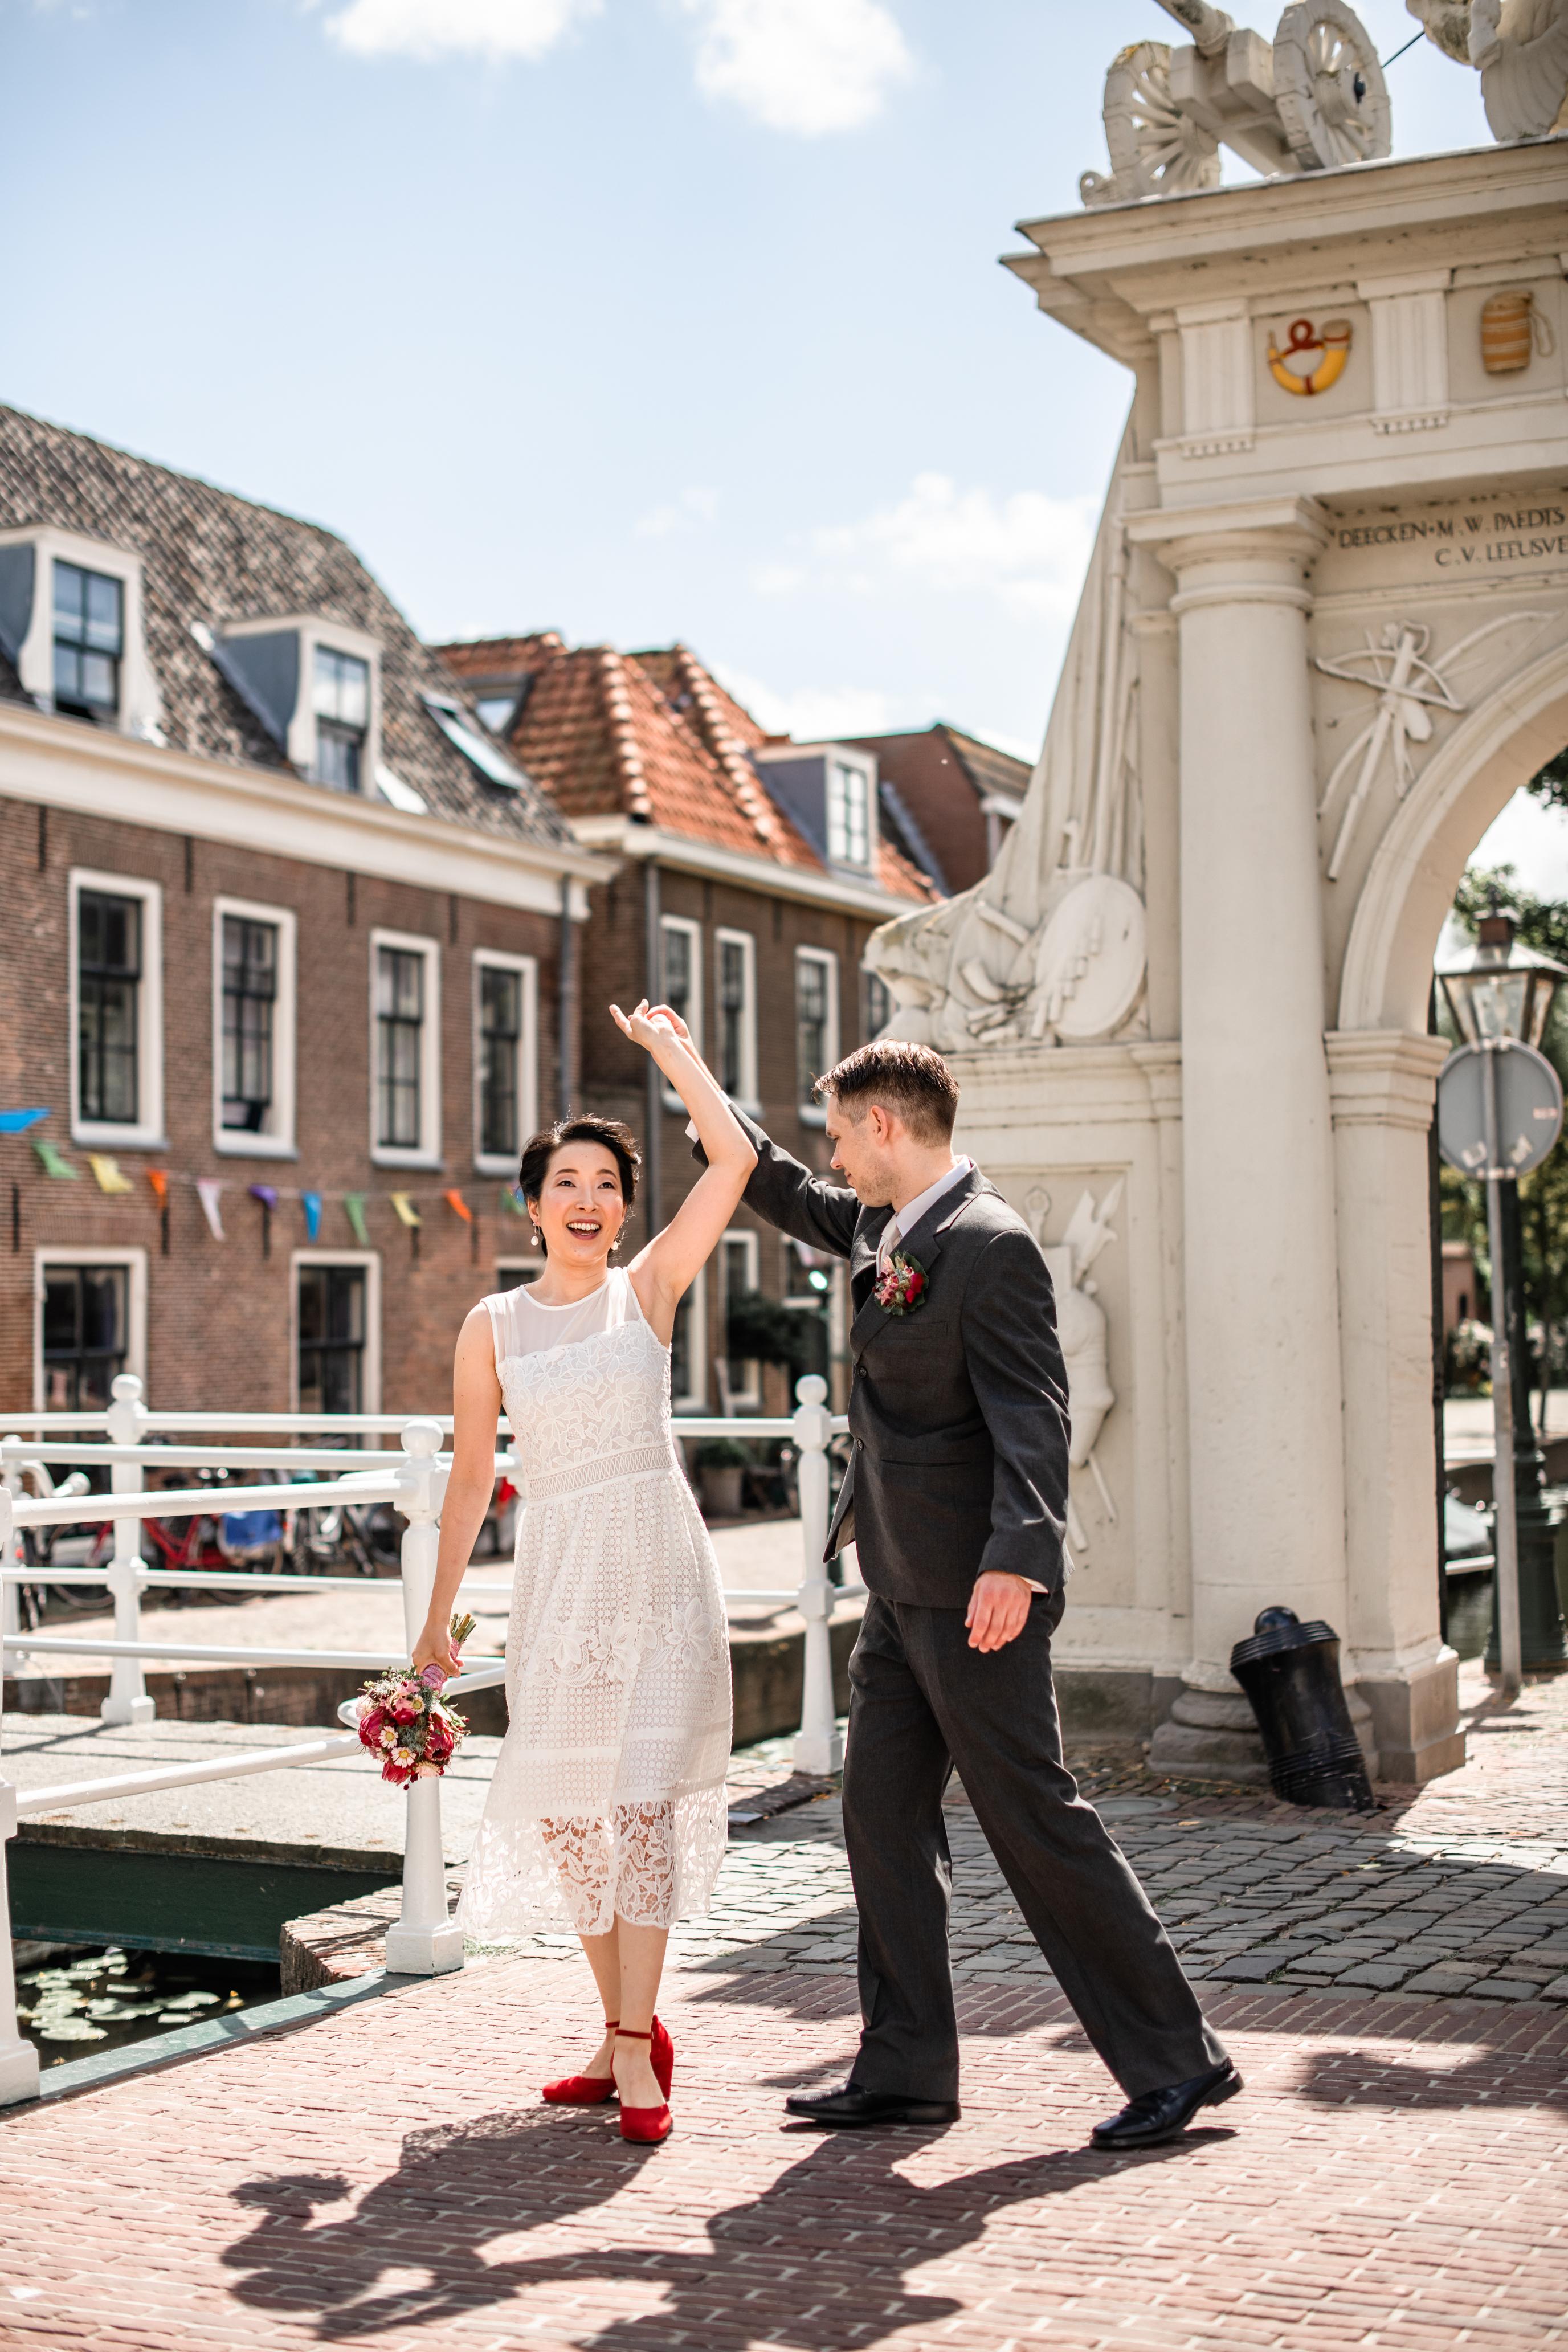 Trouwfotograaf binnenstad Leiden